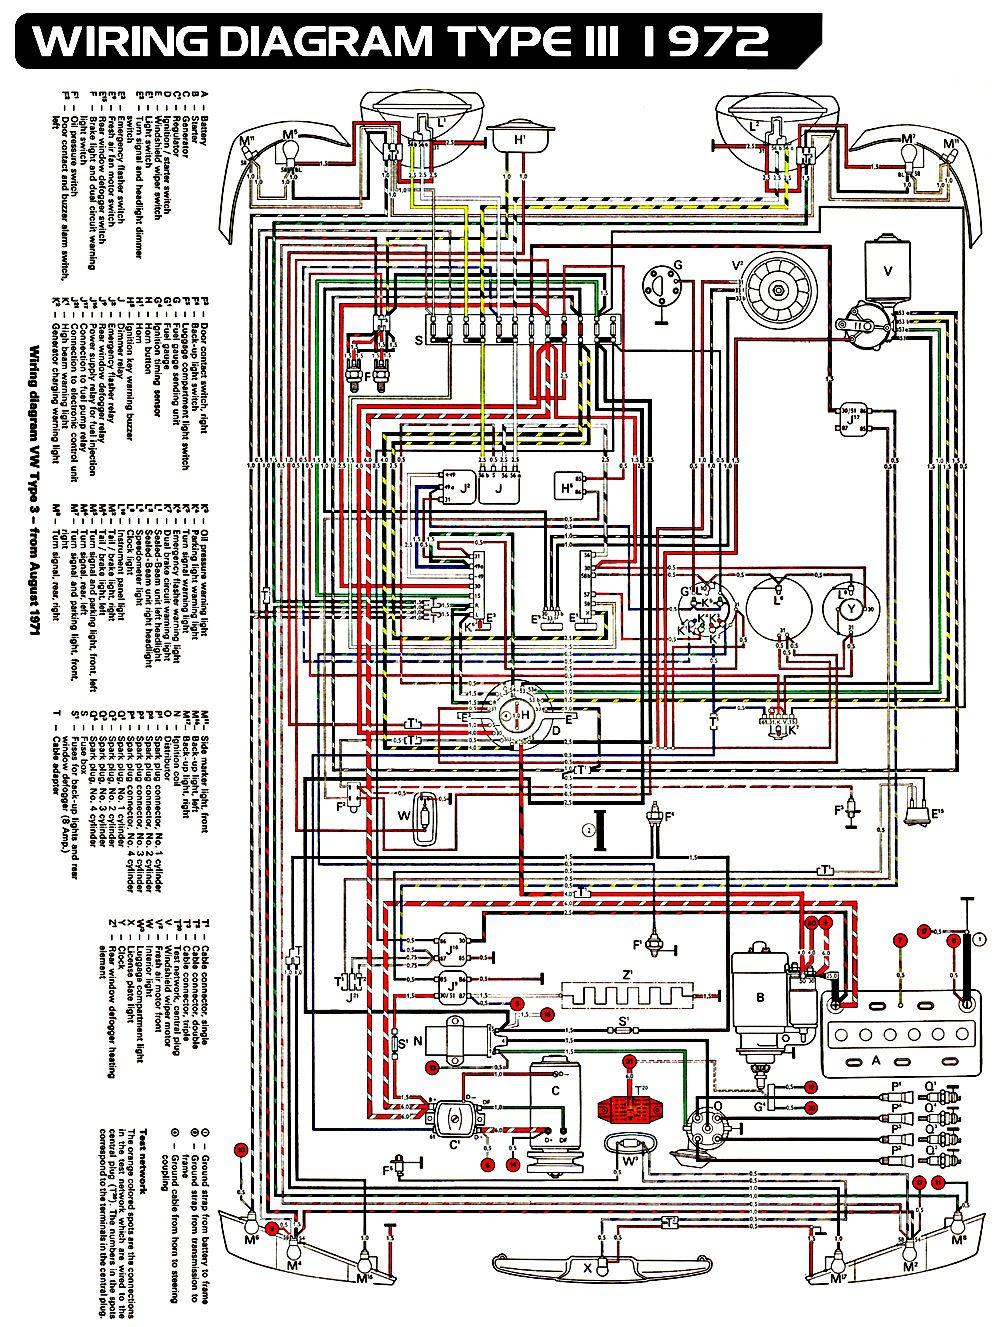 Diagram Database And Images All Diagram Database Website